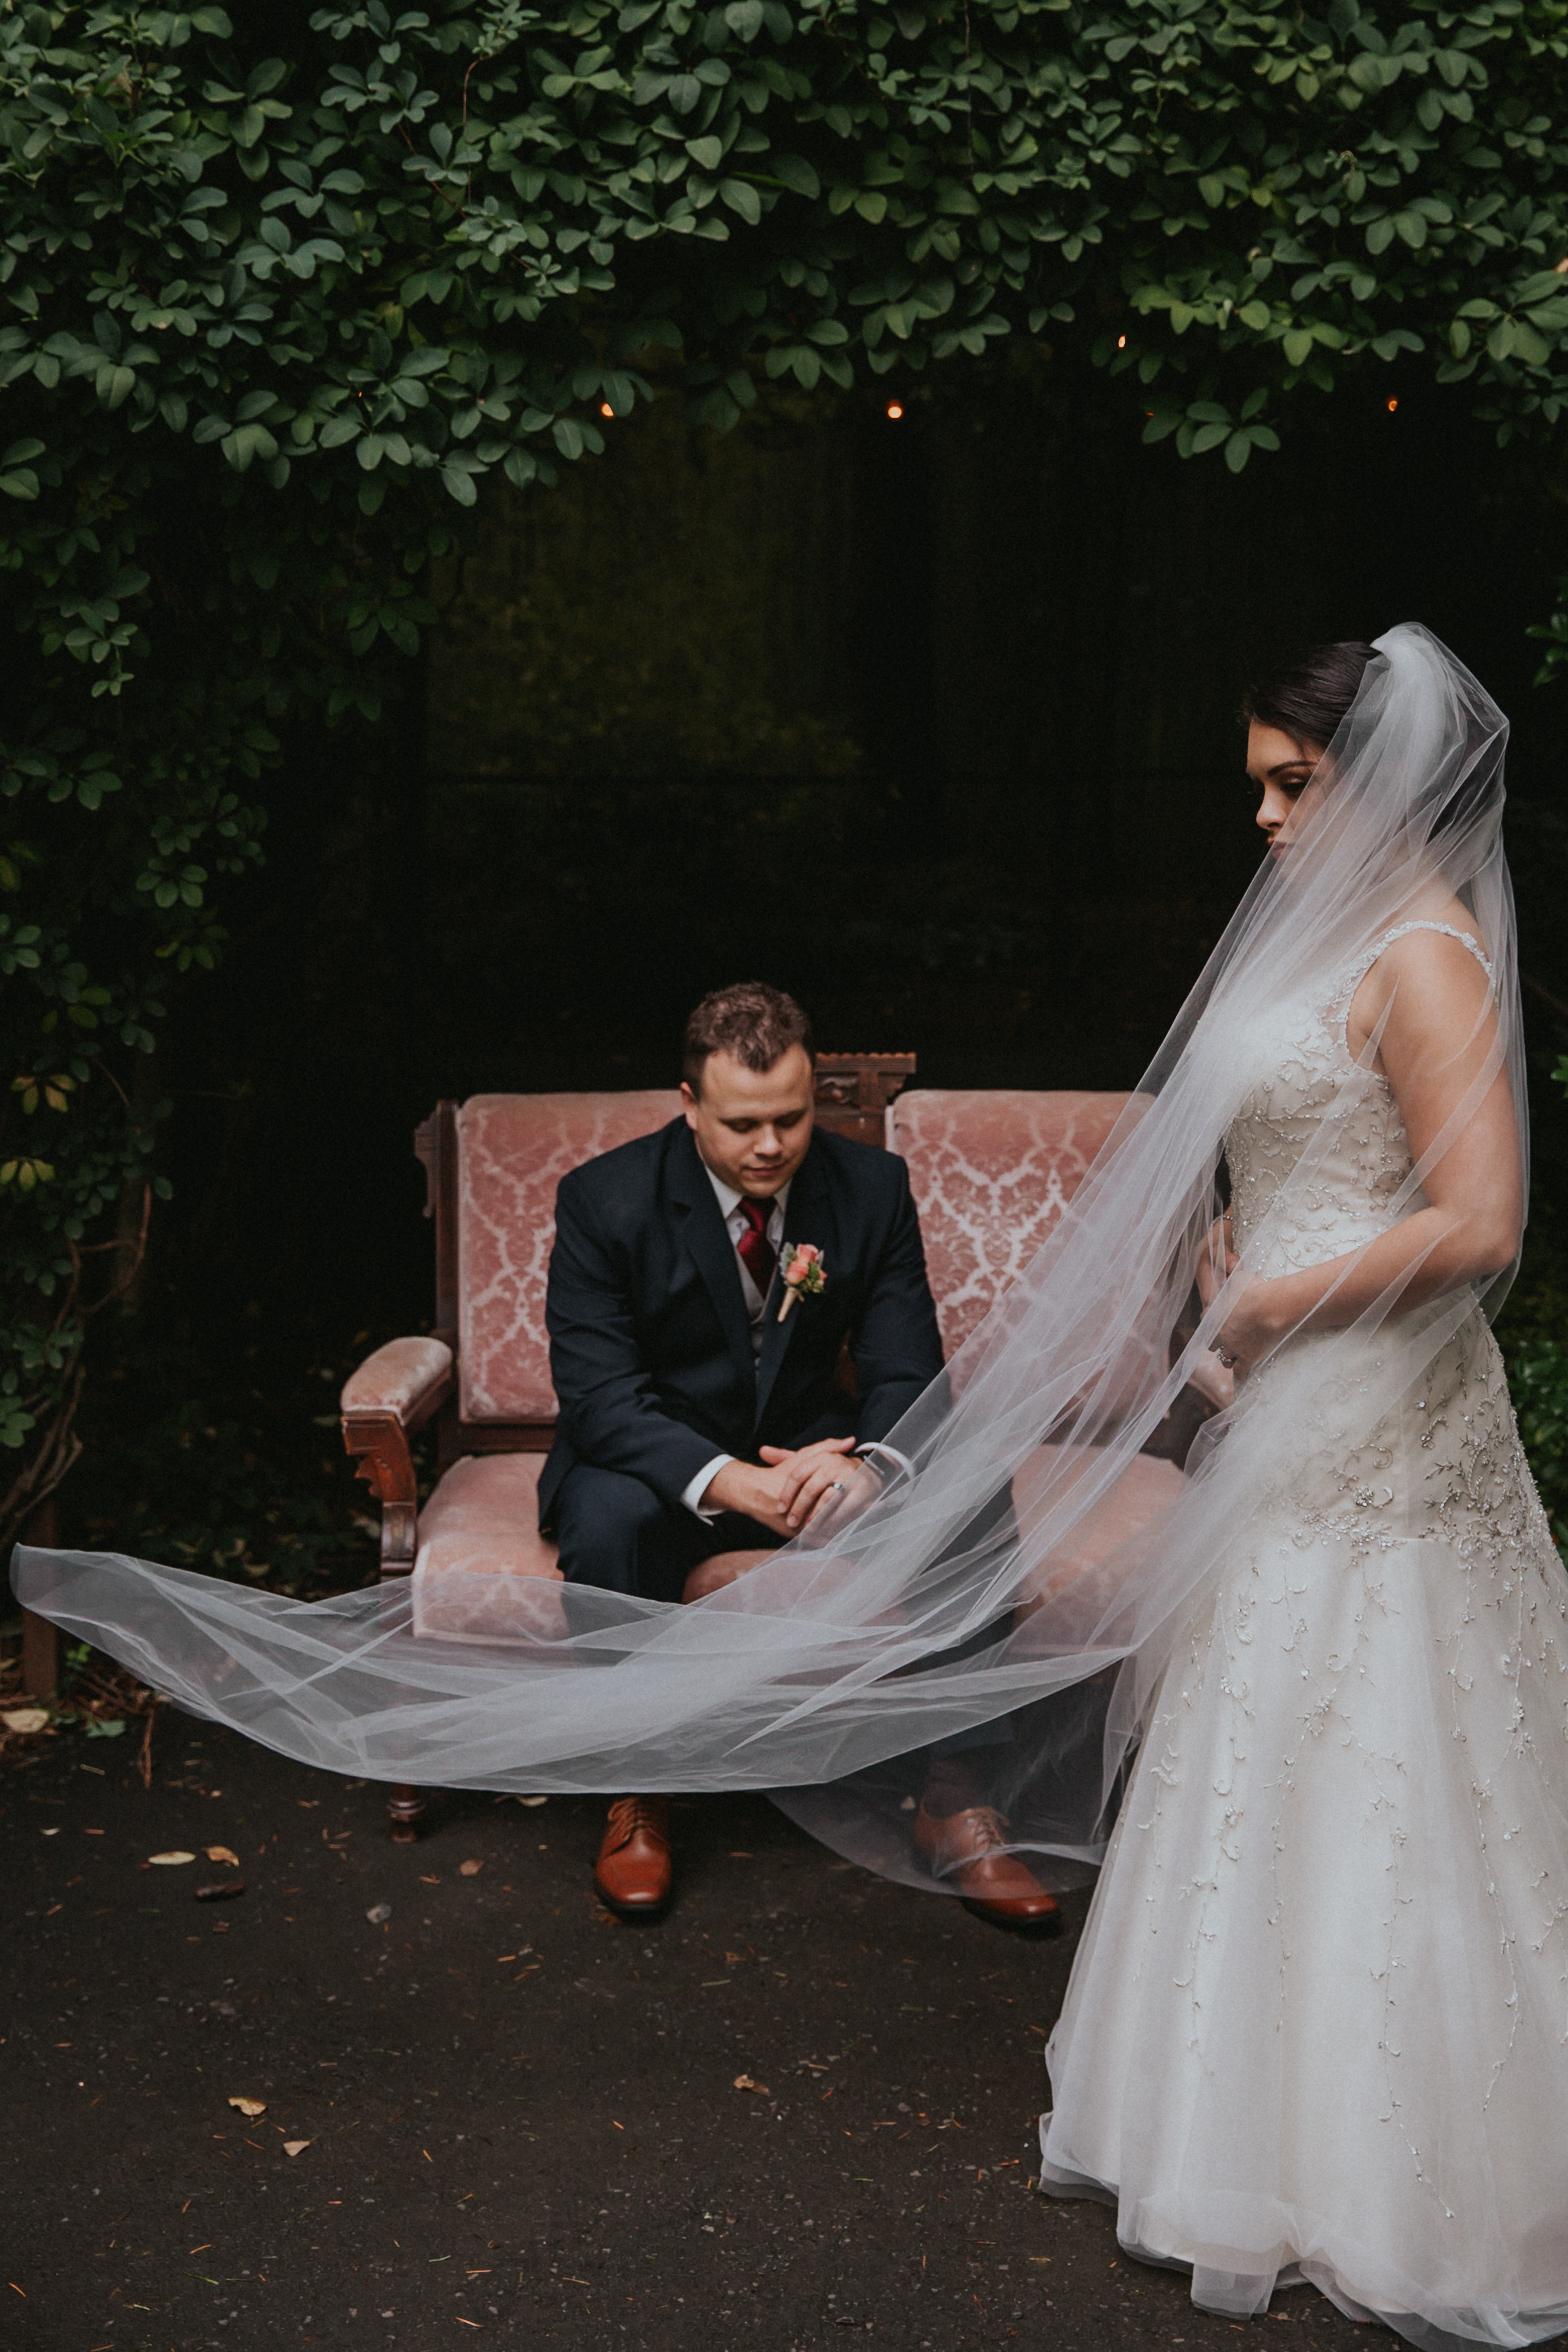 Portland_wedding_photographer_McMenamins_Alfred_Tang (4 of 6).jpg